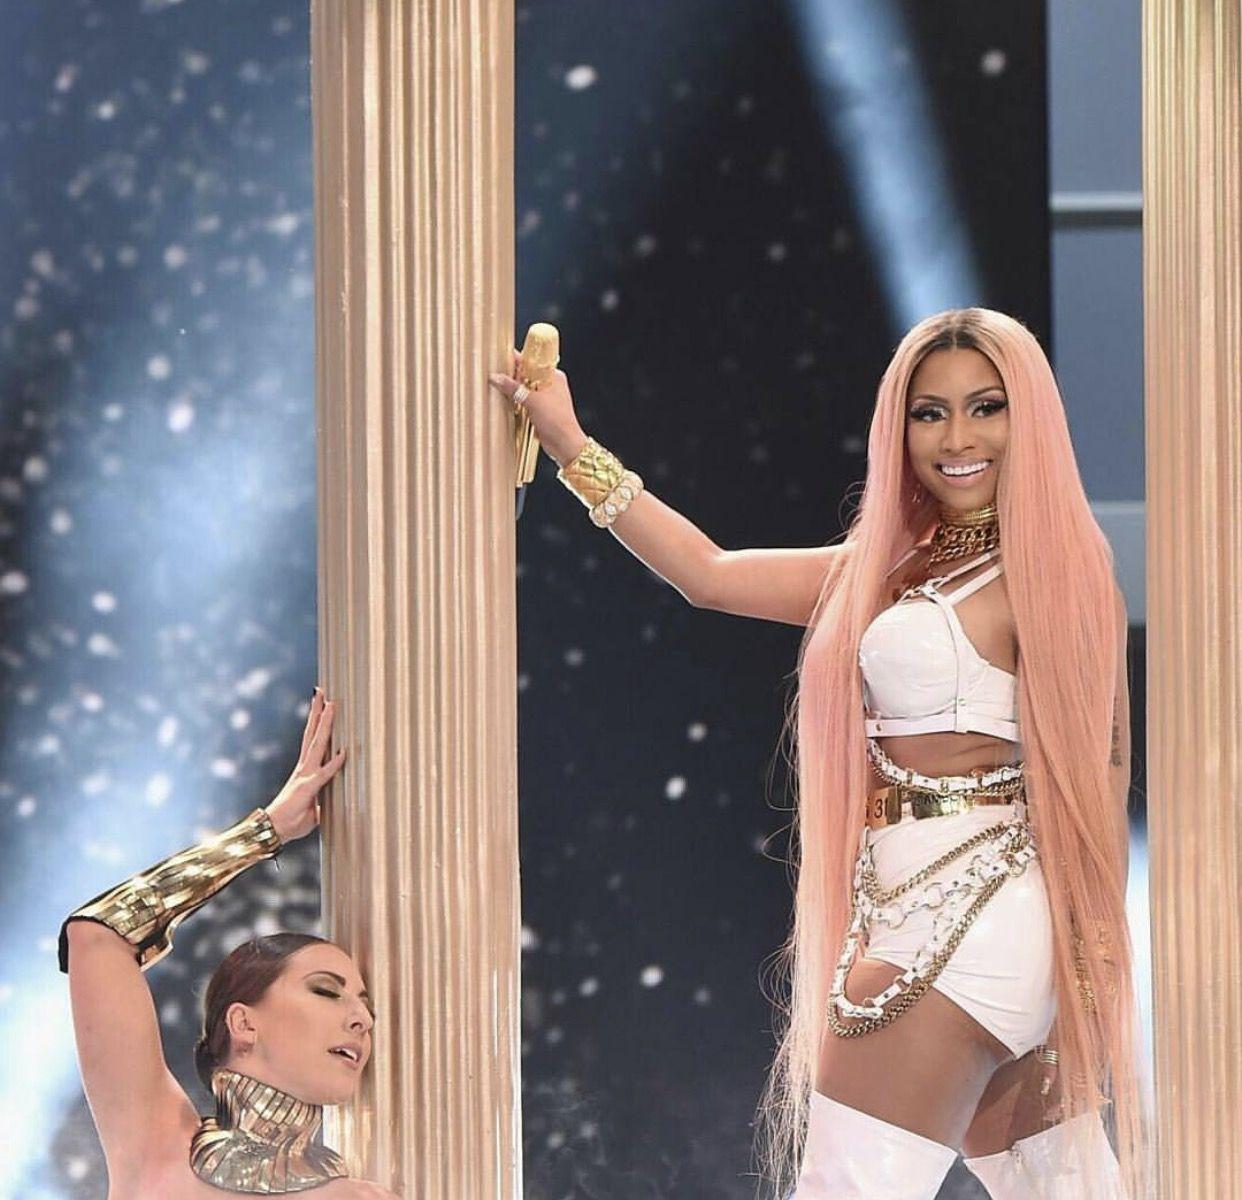 Nicki Minaj #NBAAWARDS 2017 | Nicki minaj outfits, Nicki ...